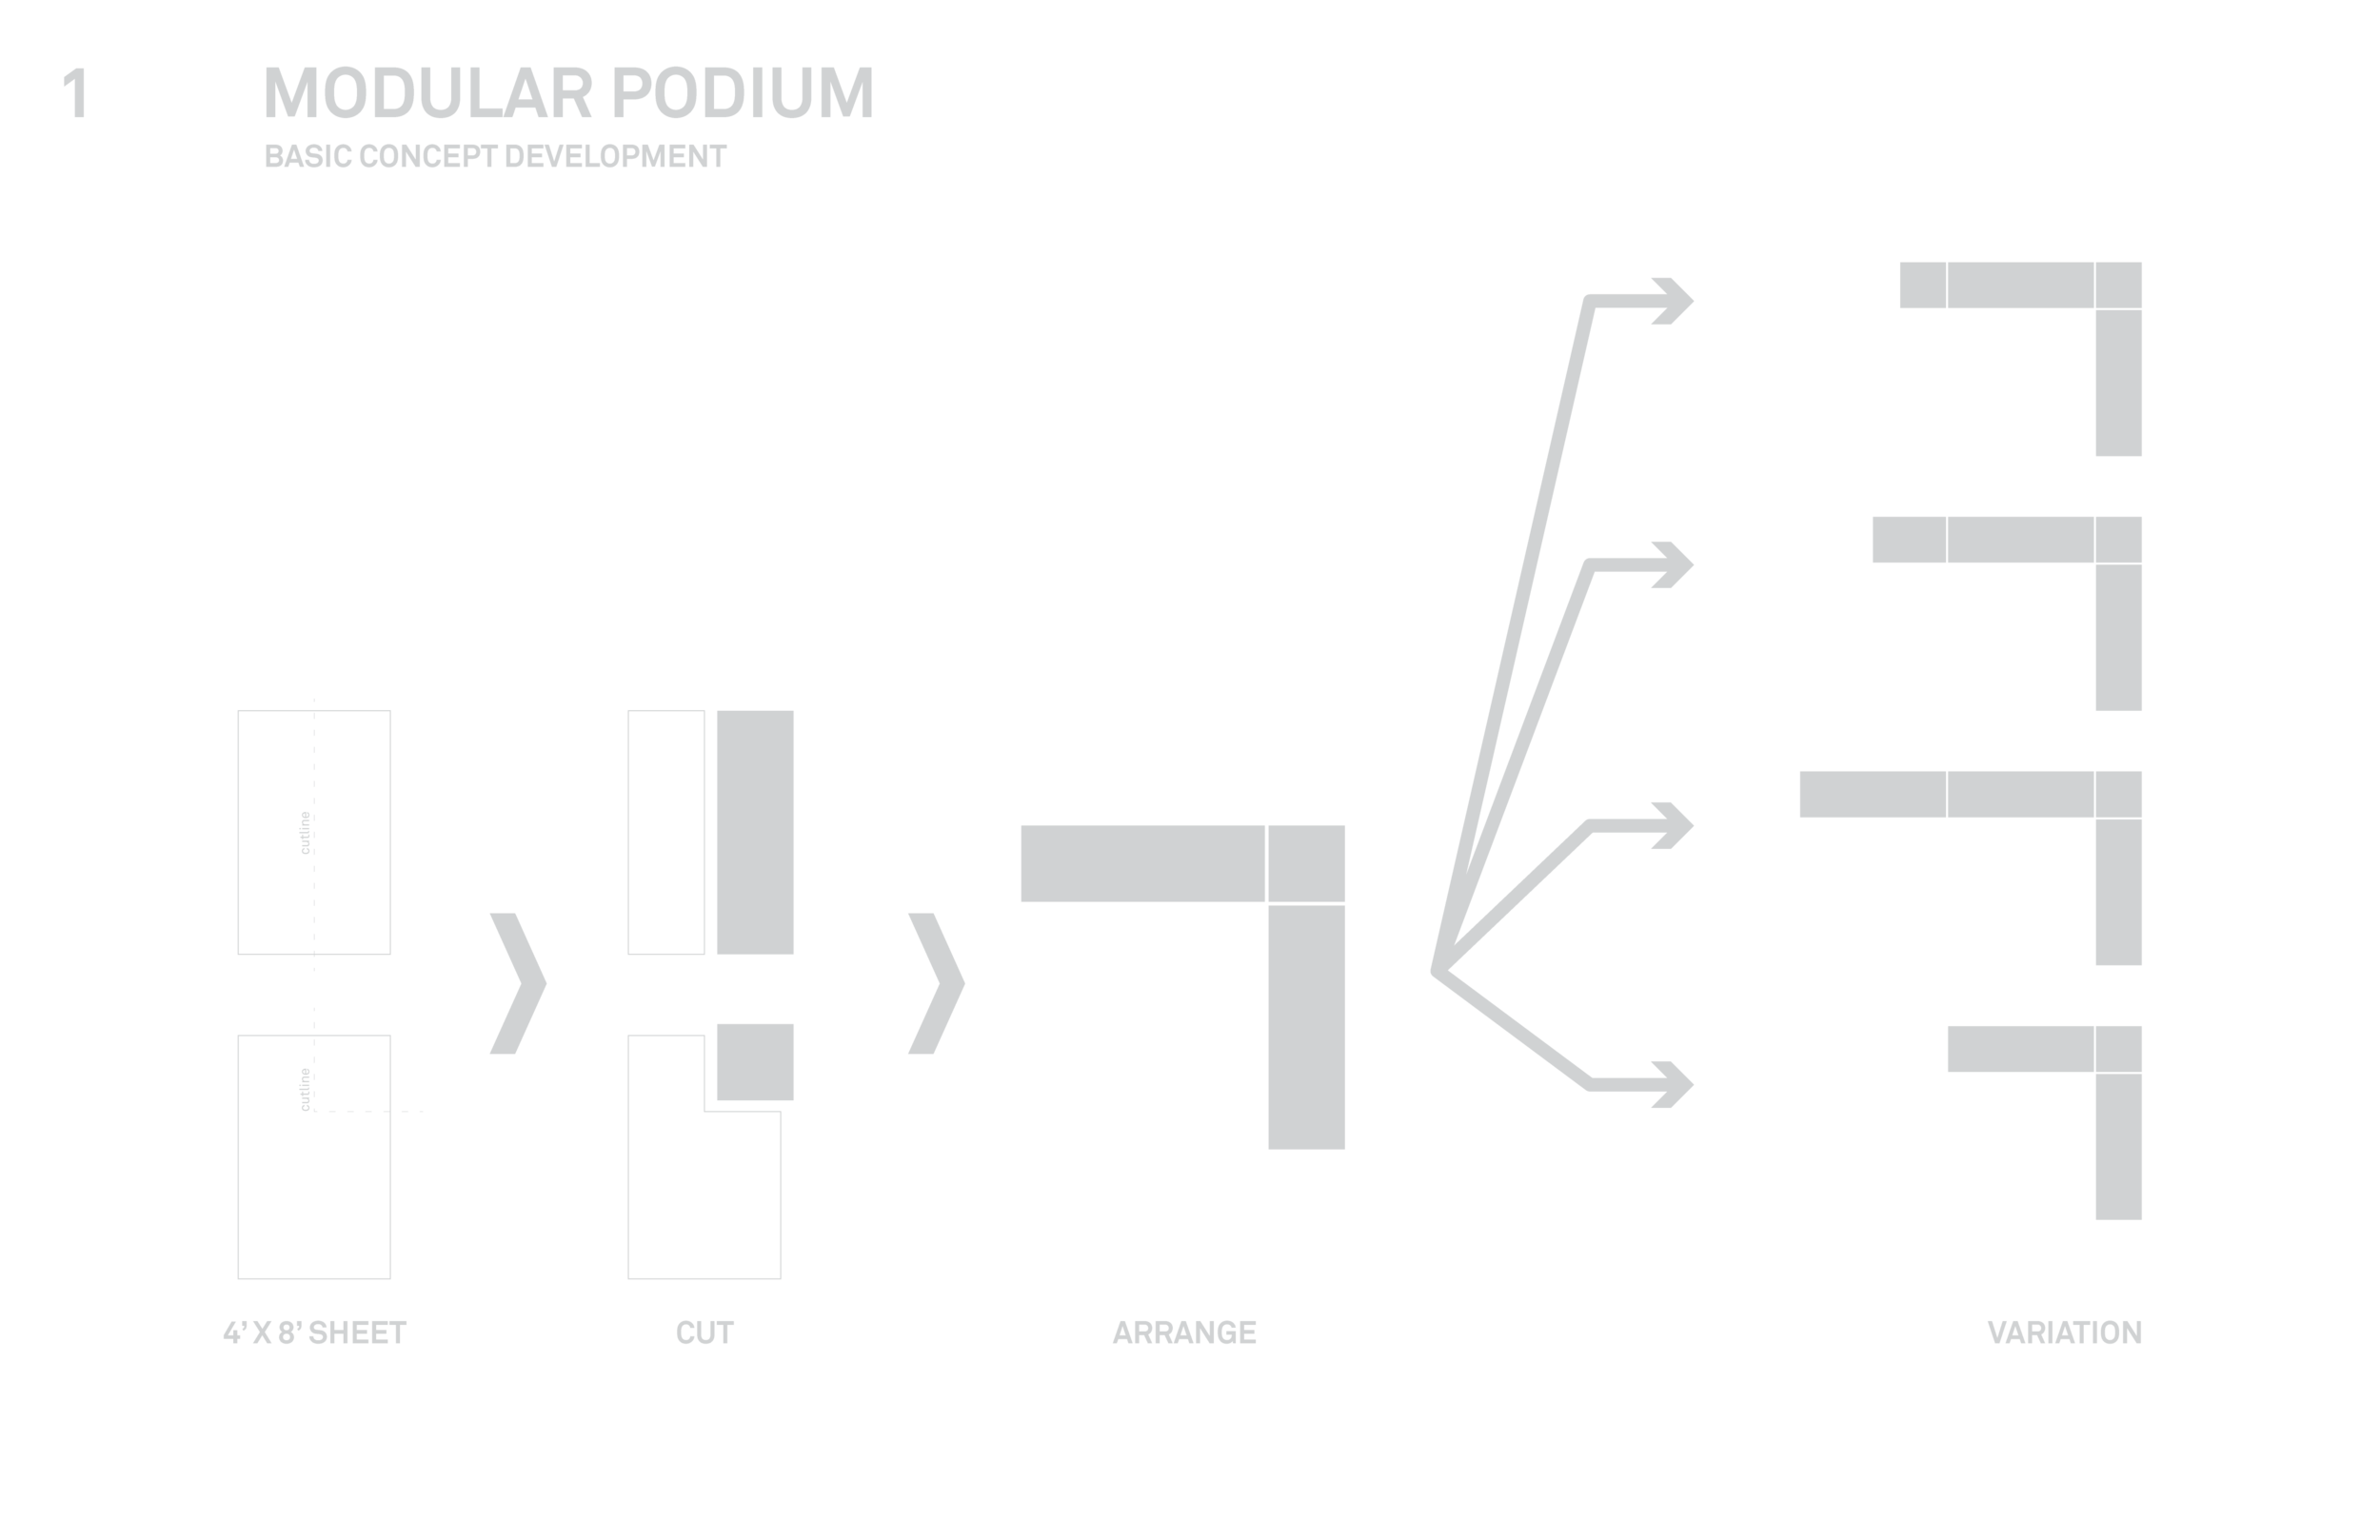 podium layouts2-01.png